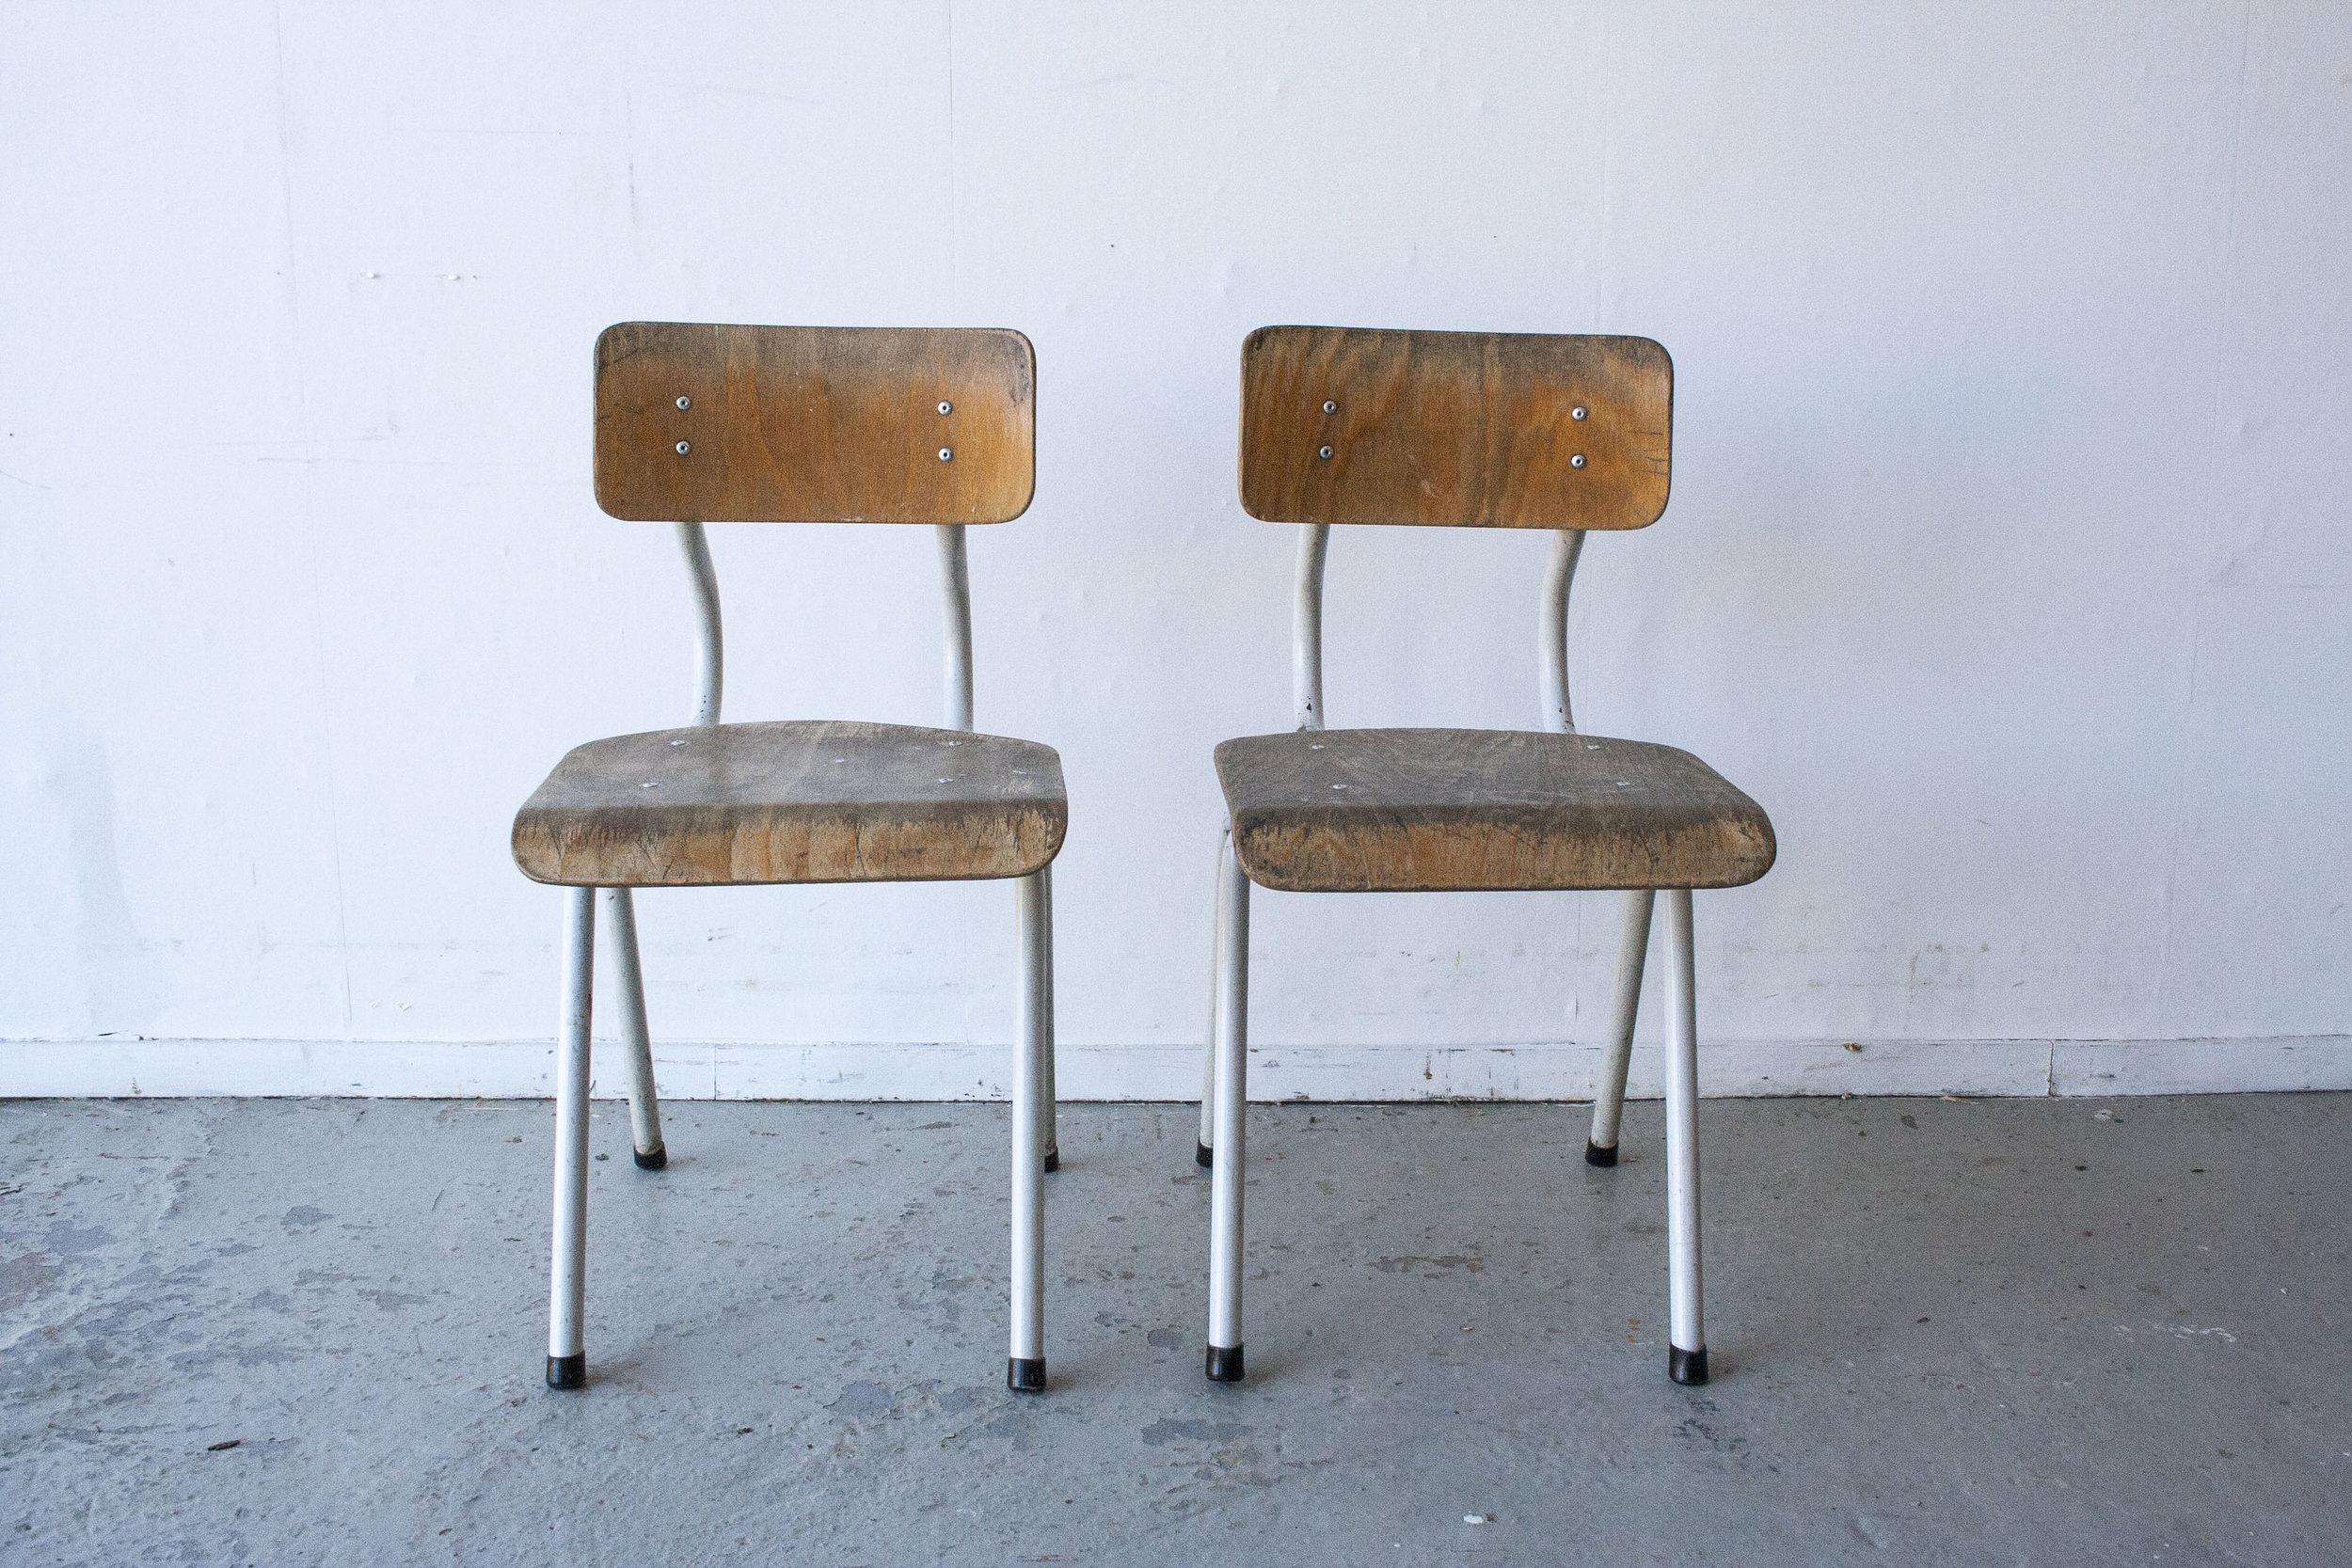 2 x Witte houten stoeltes - Firma zoethout_1.jpg